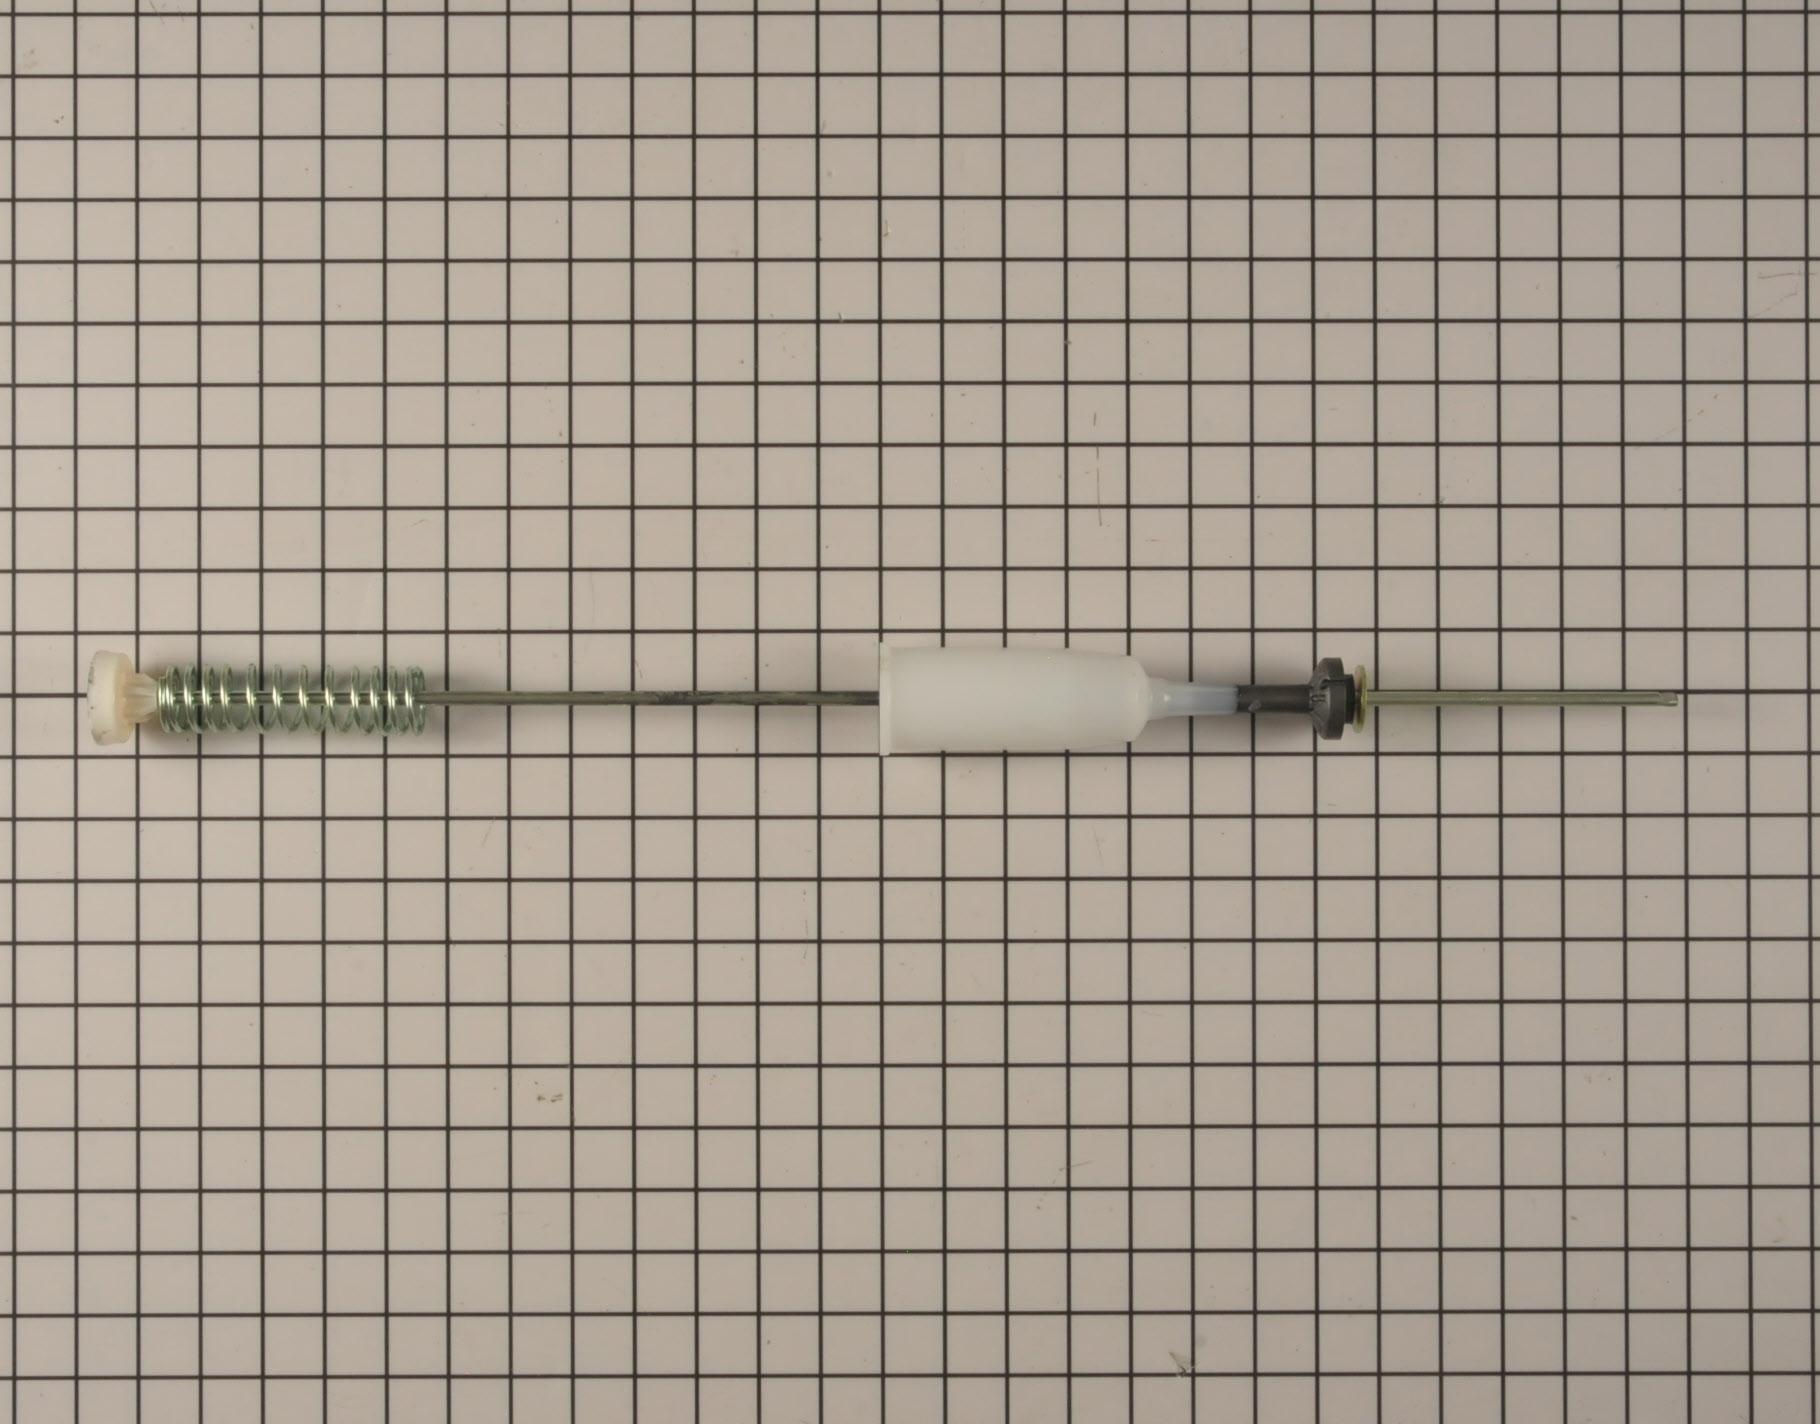 LG Washing Machine Part # 4902FA1665W - Suspension Rod